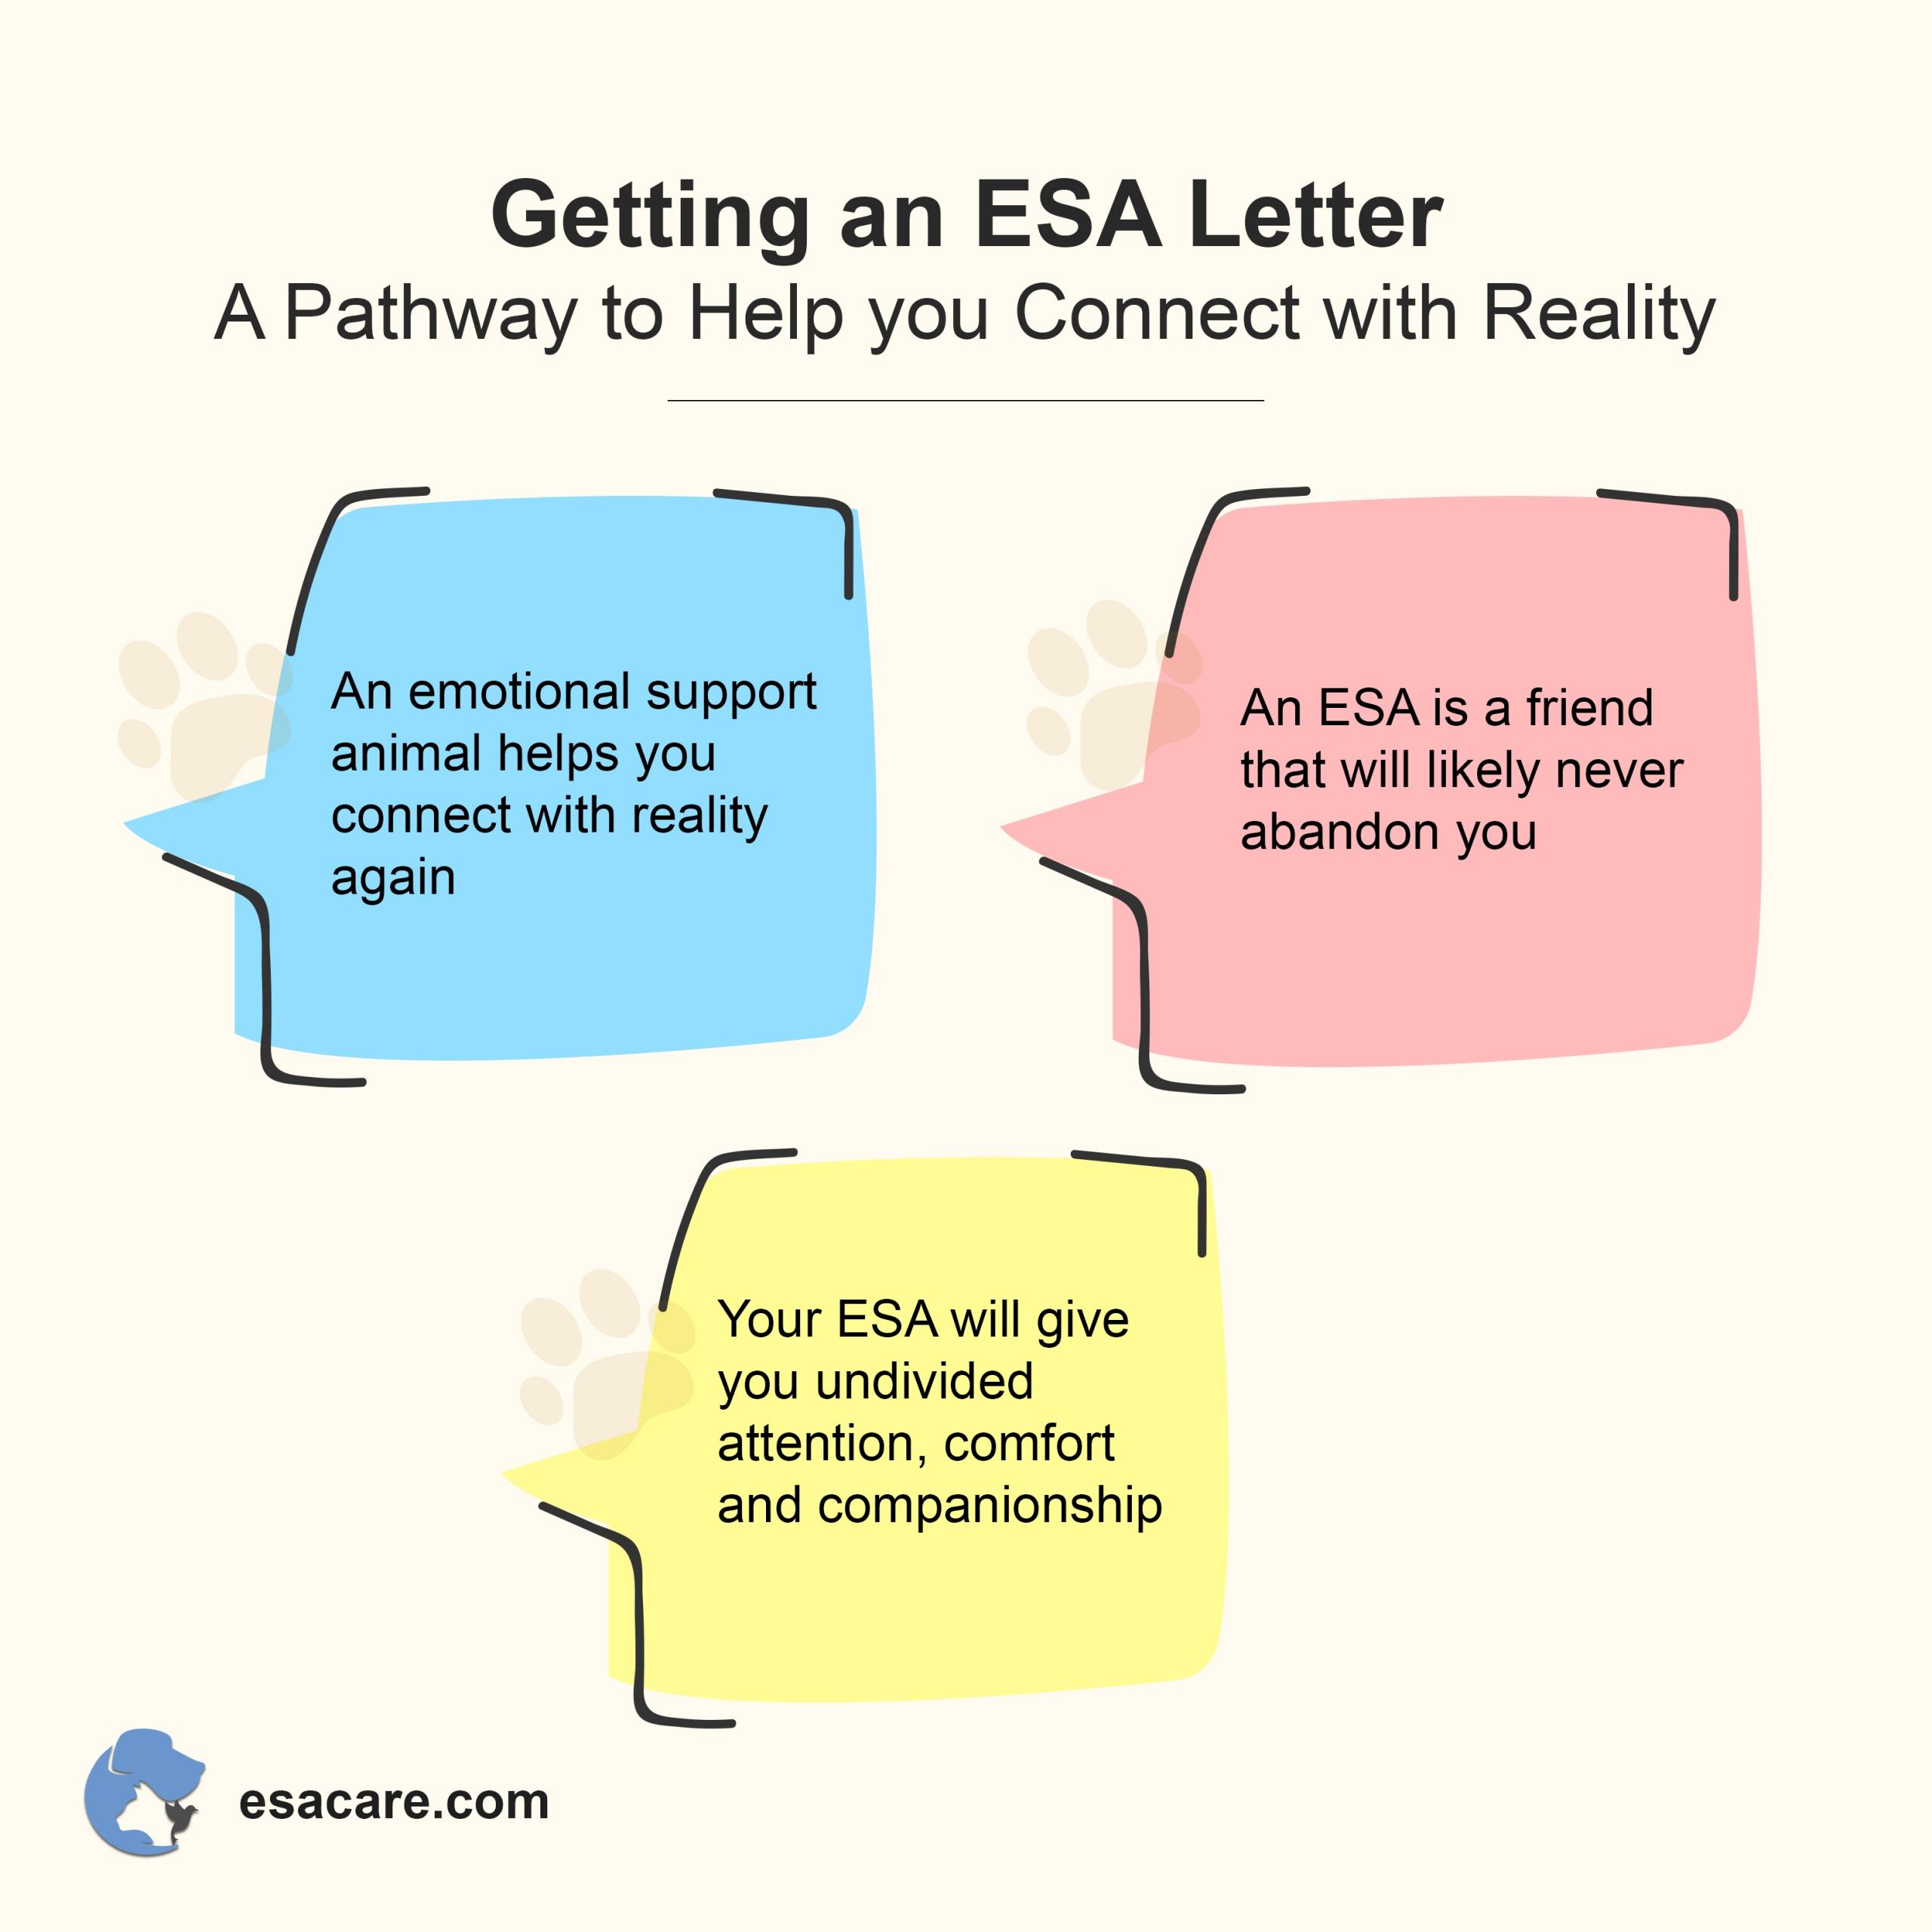 get an esa letter